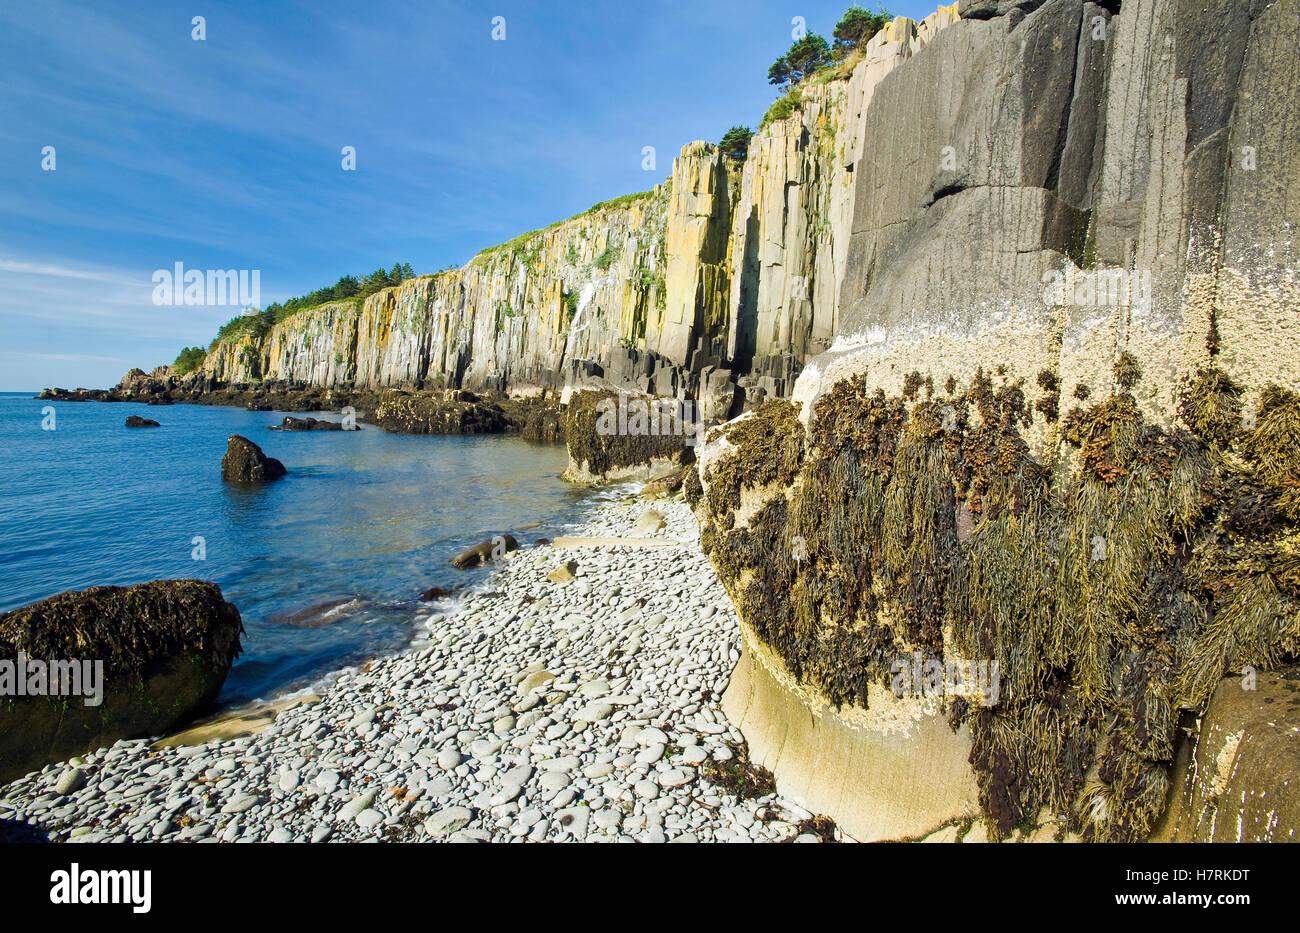 basalt rock cliffs  bay of fundy  brier island  nova